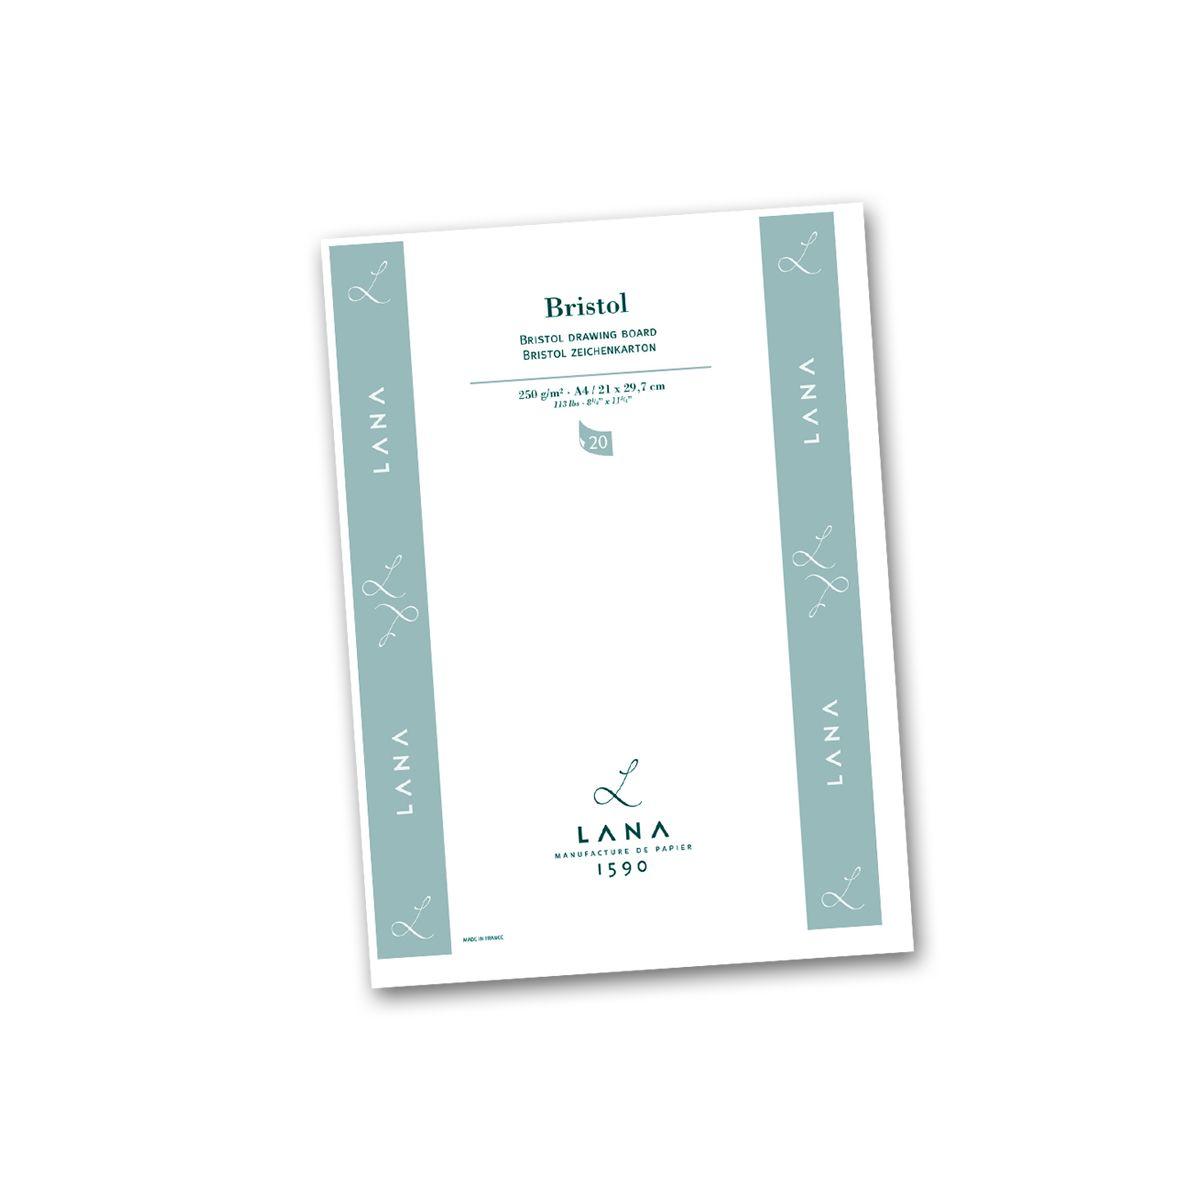 Papel Lana Bristol A4 250g 20 folhas - Lana